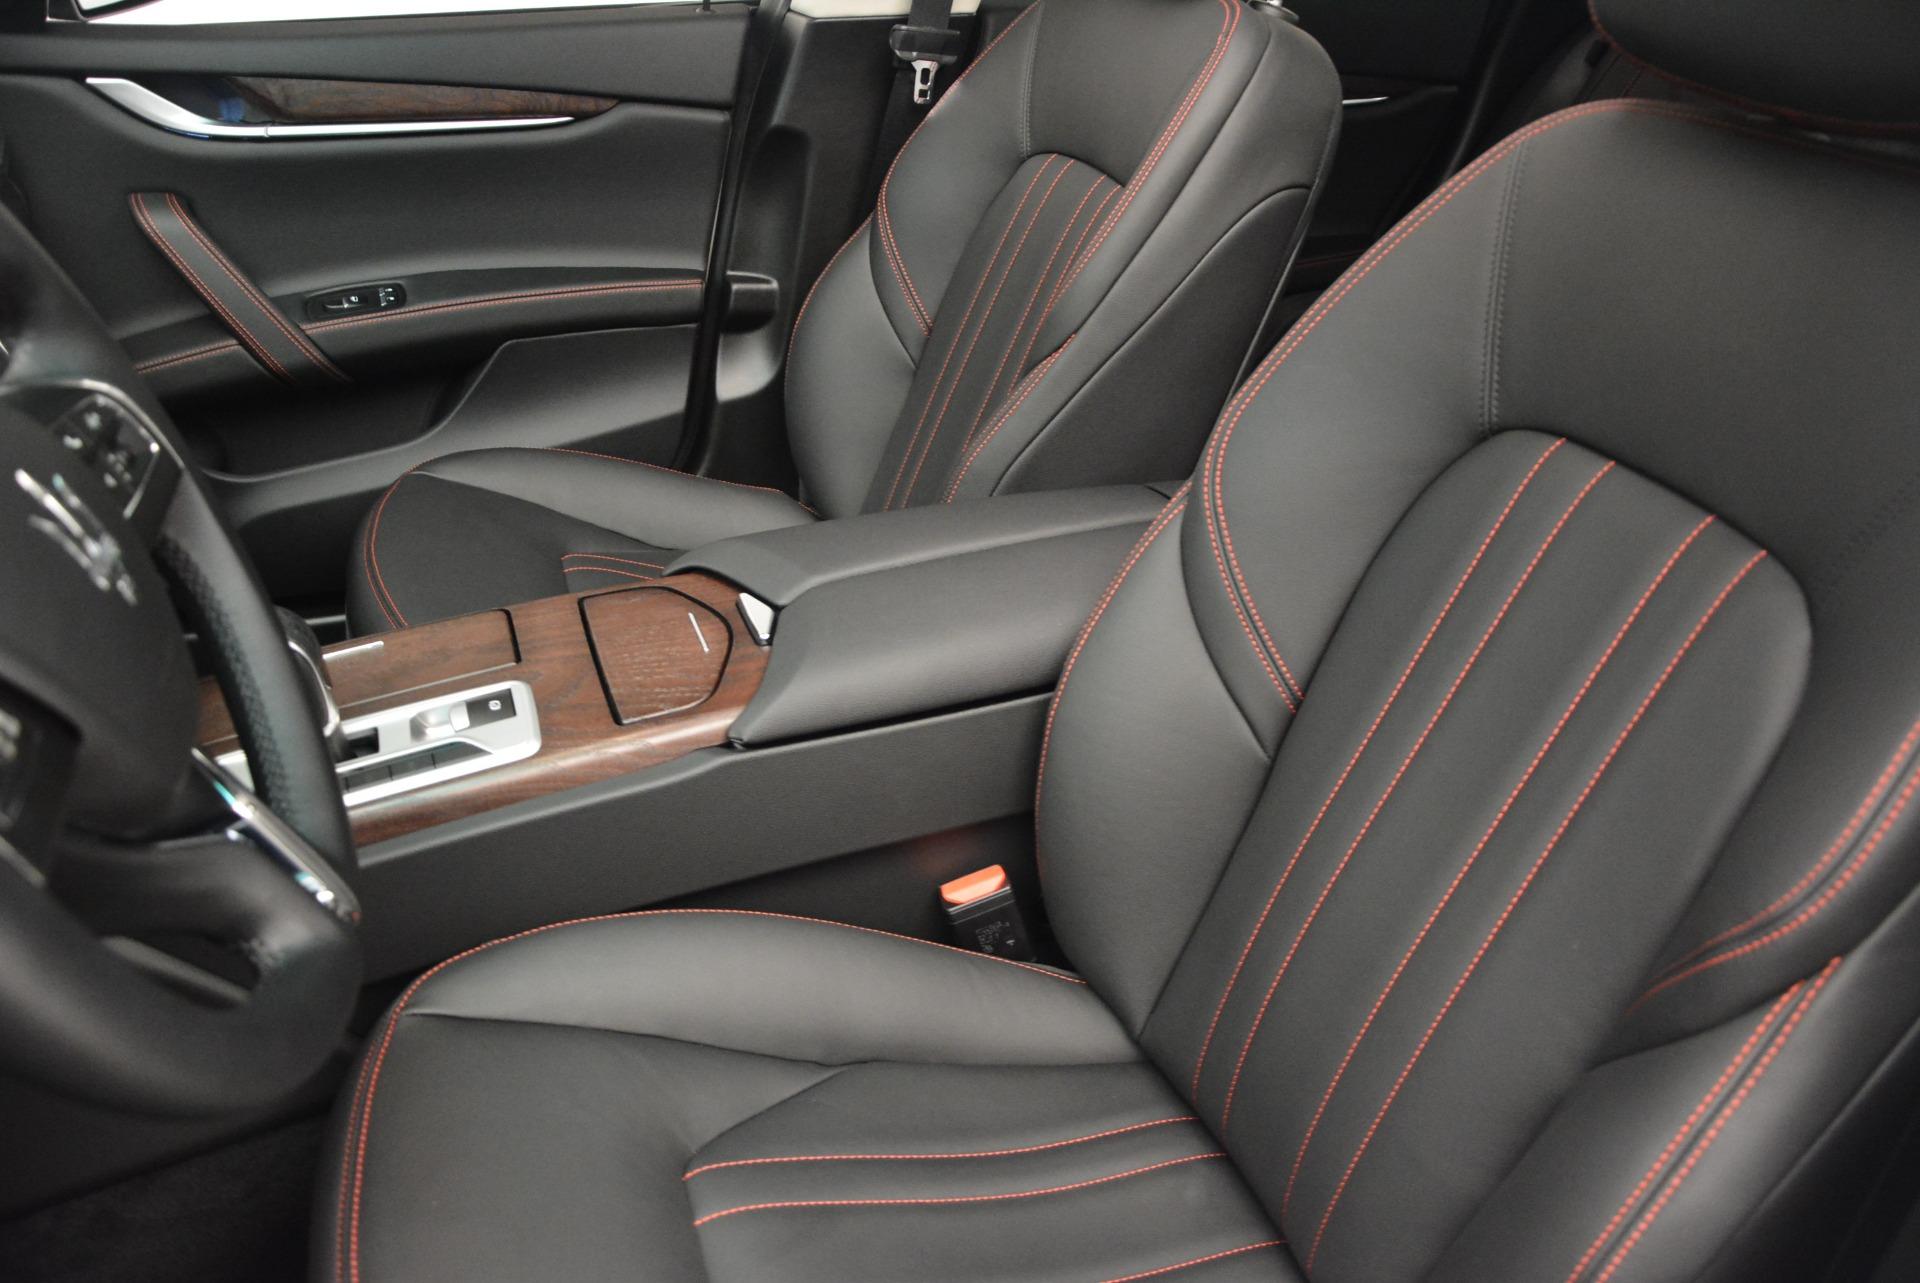 Used 2016 Maserati Ghibli S Q4  EX-LOANER For Sale In Greenwich, CT. Alfa Romeo of Greenwich, W252 669_p15